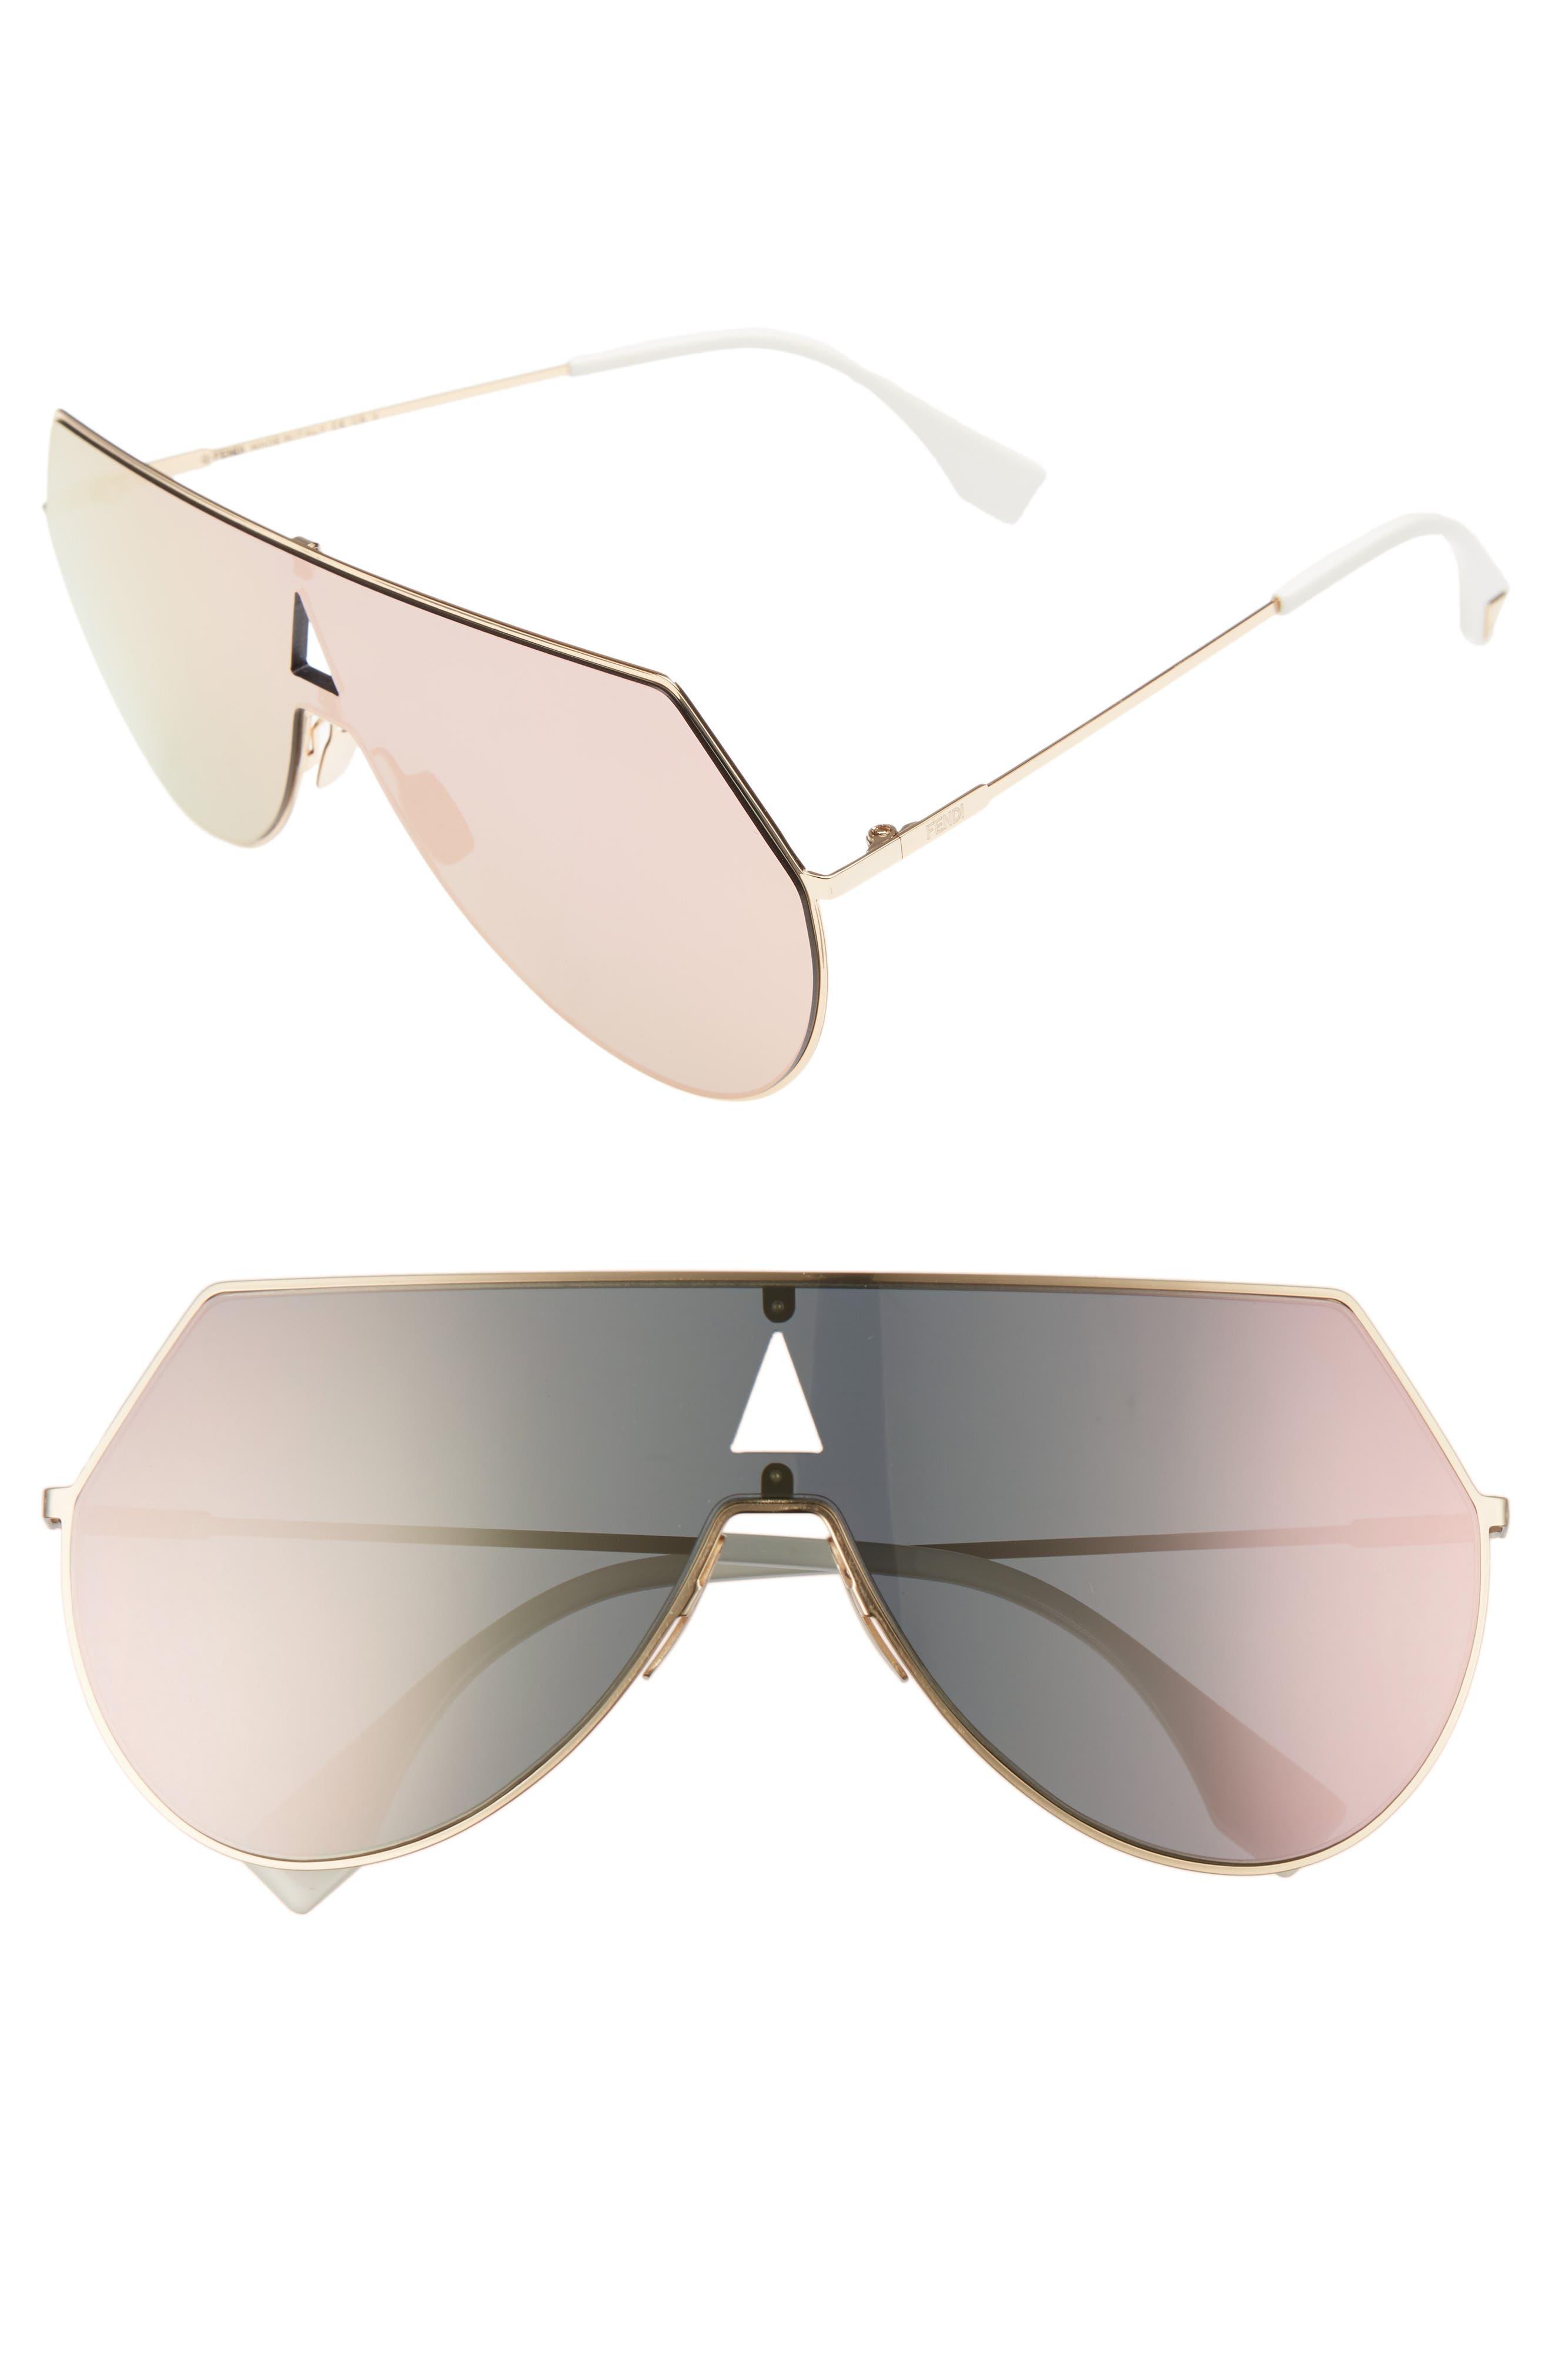 99mm Eyeline Aviator Sunglasses, Main, color, ROSE GOLD